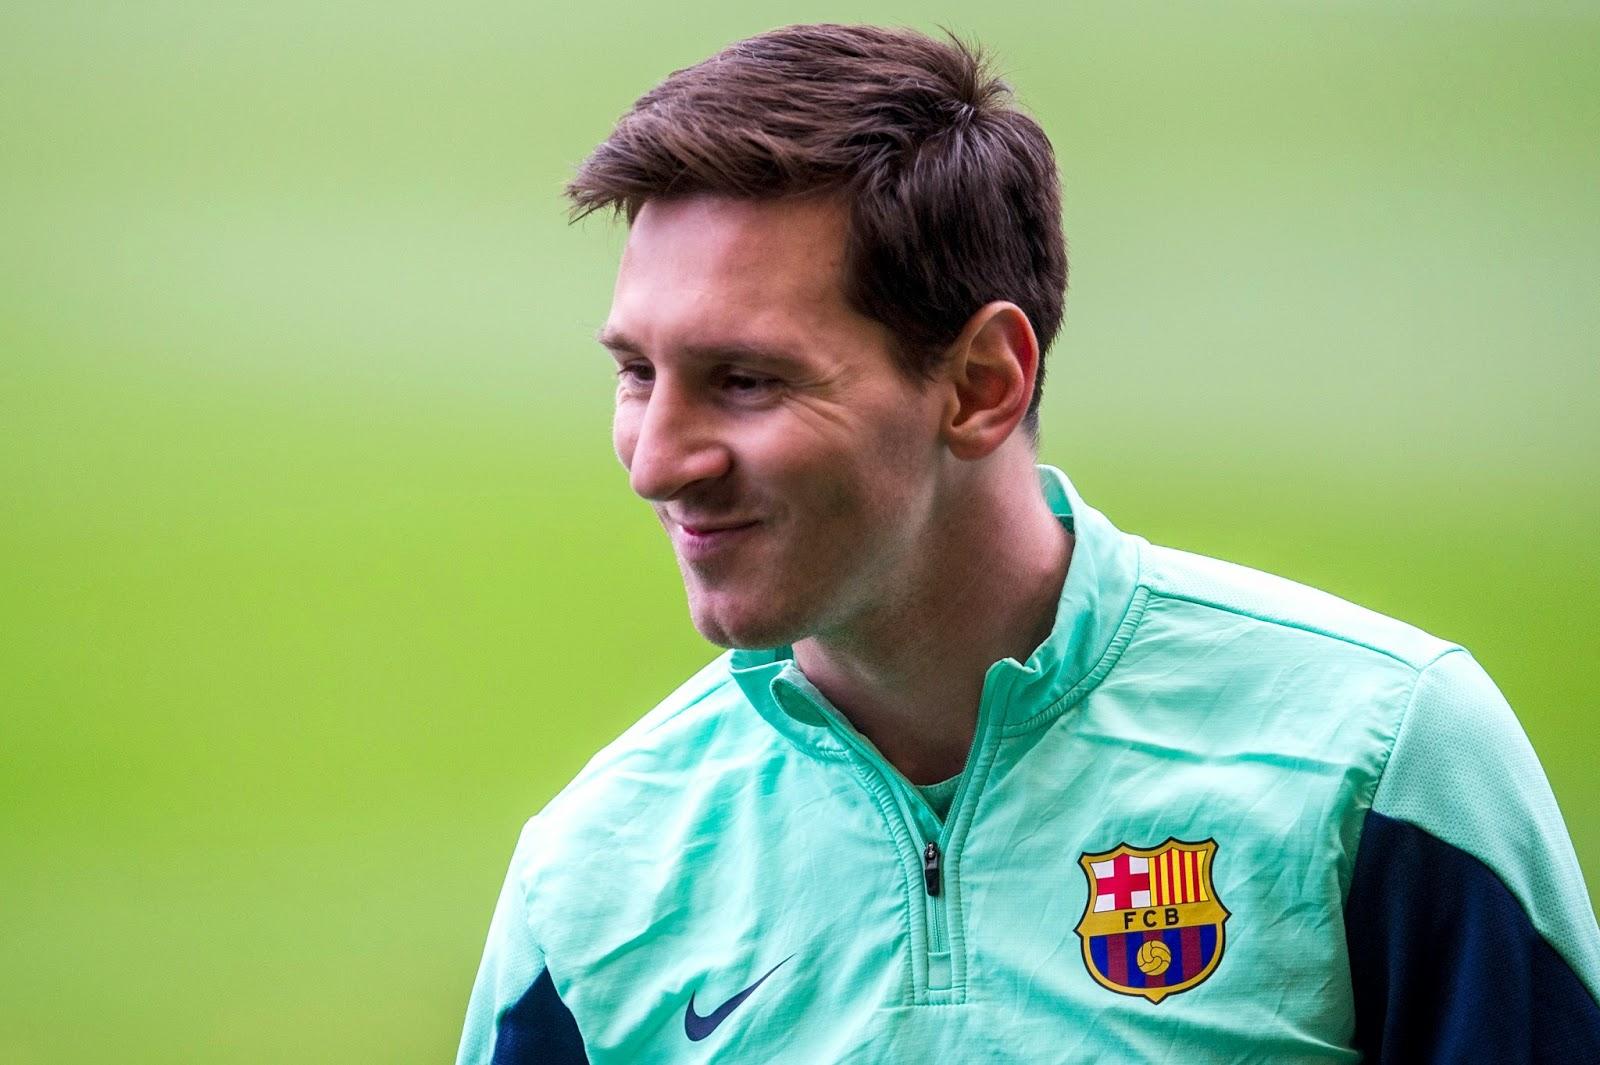 Lionel Messi Full HD Wallpapers 2016 Encarles Wallpaper 1600x1065